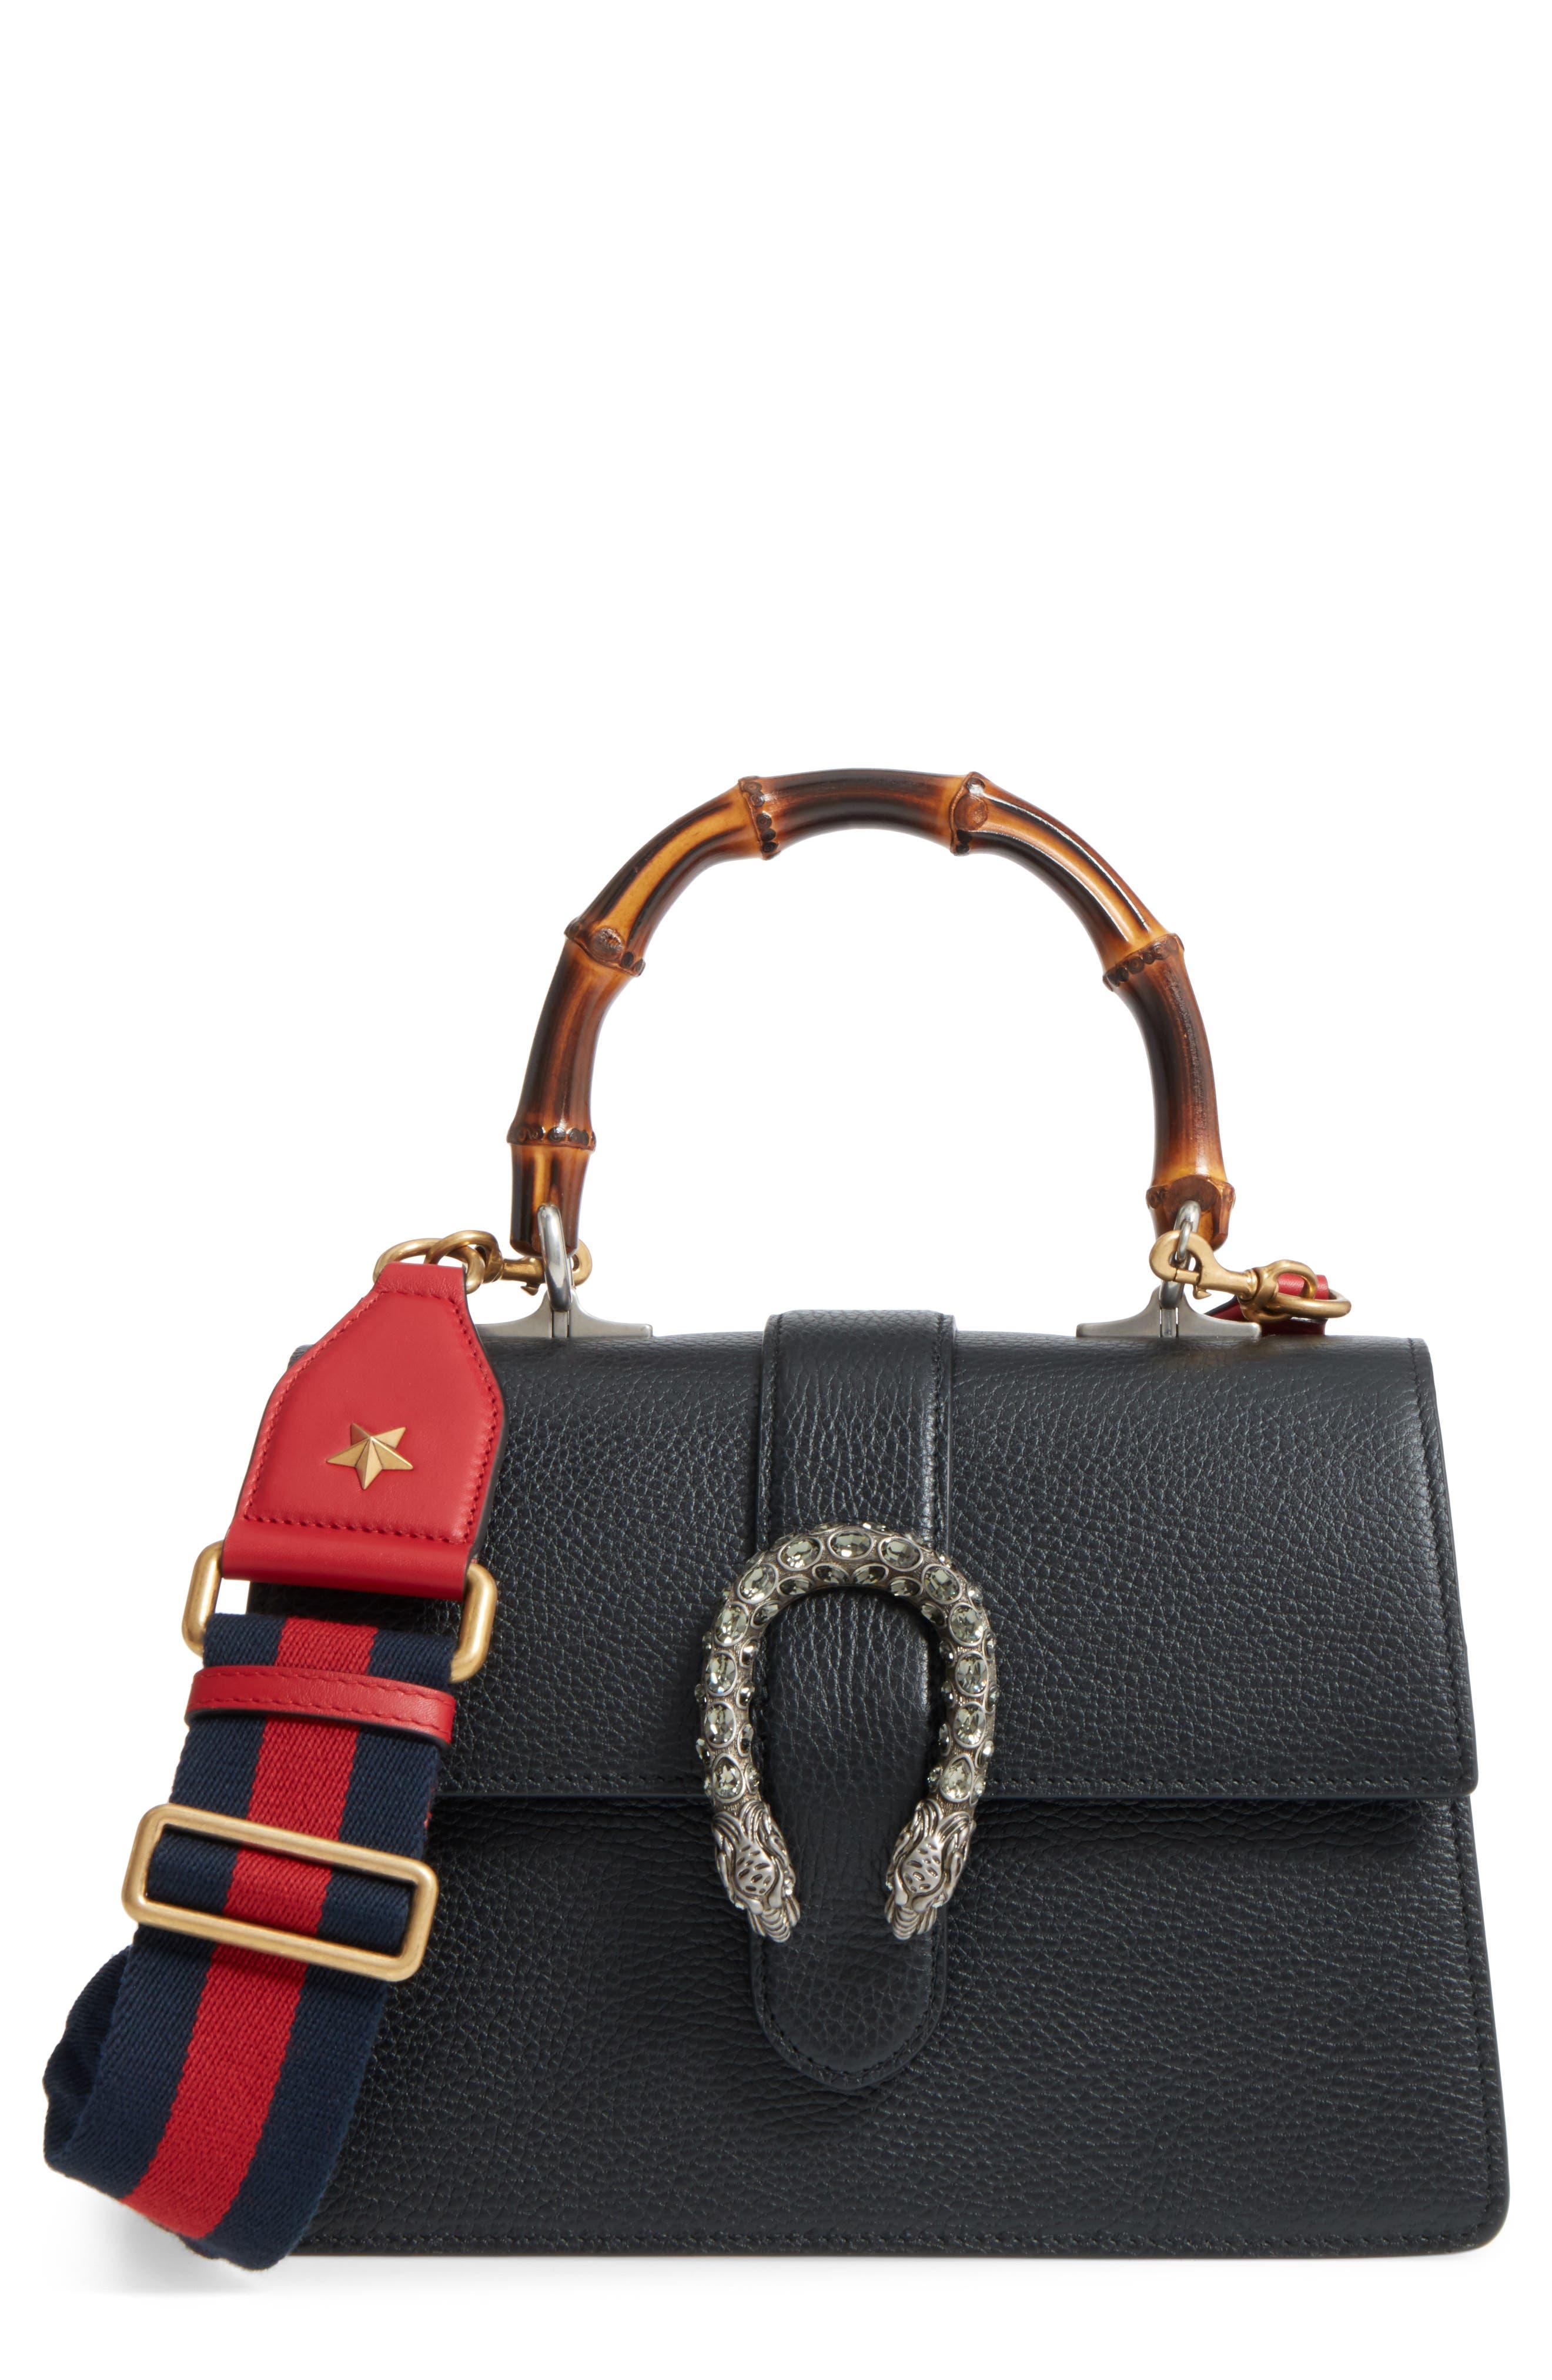 Gucci Medium Dionysus Leather Top Handle Satchel